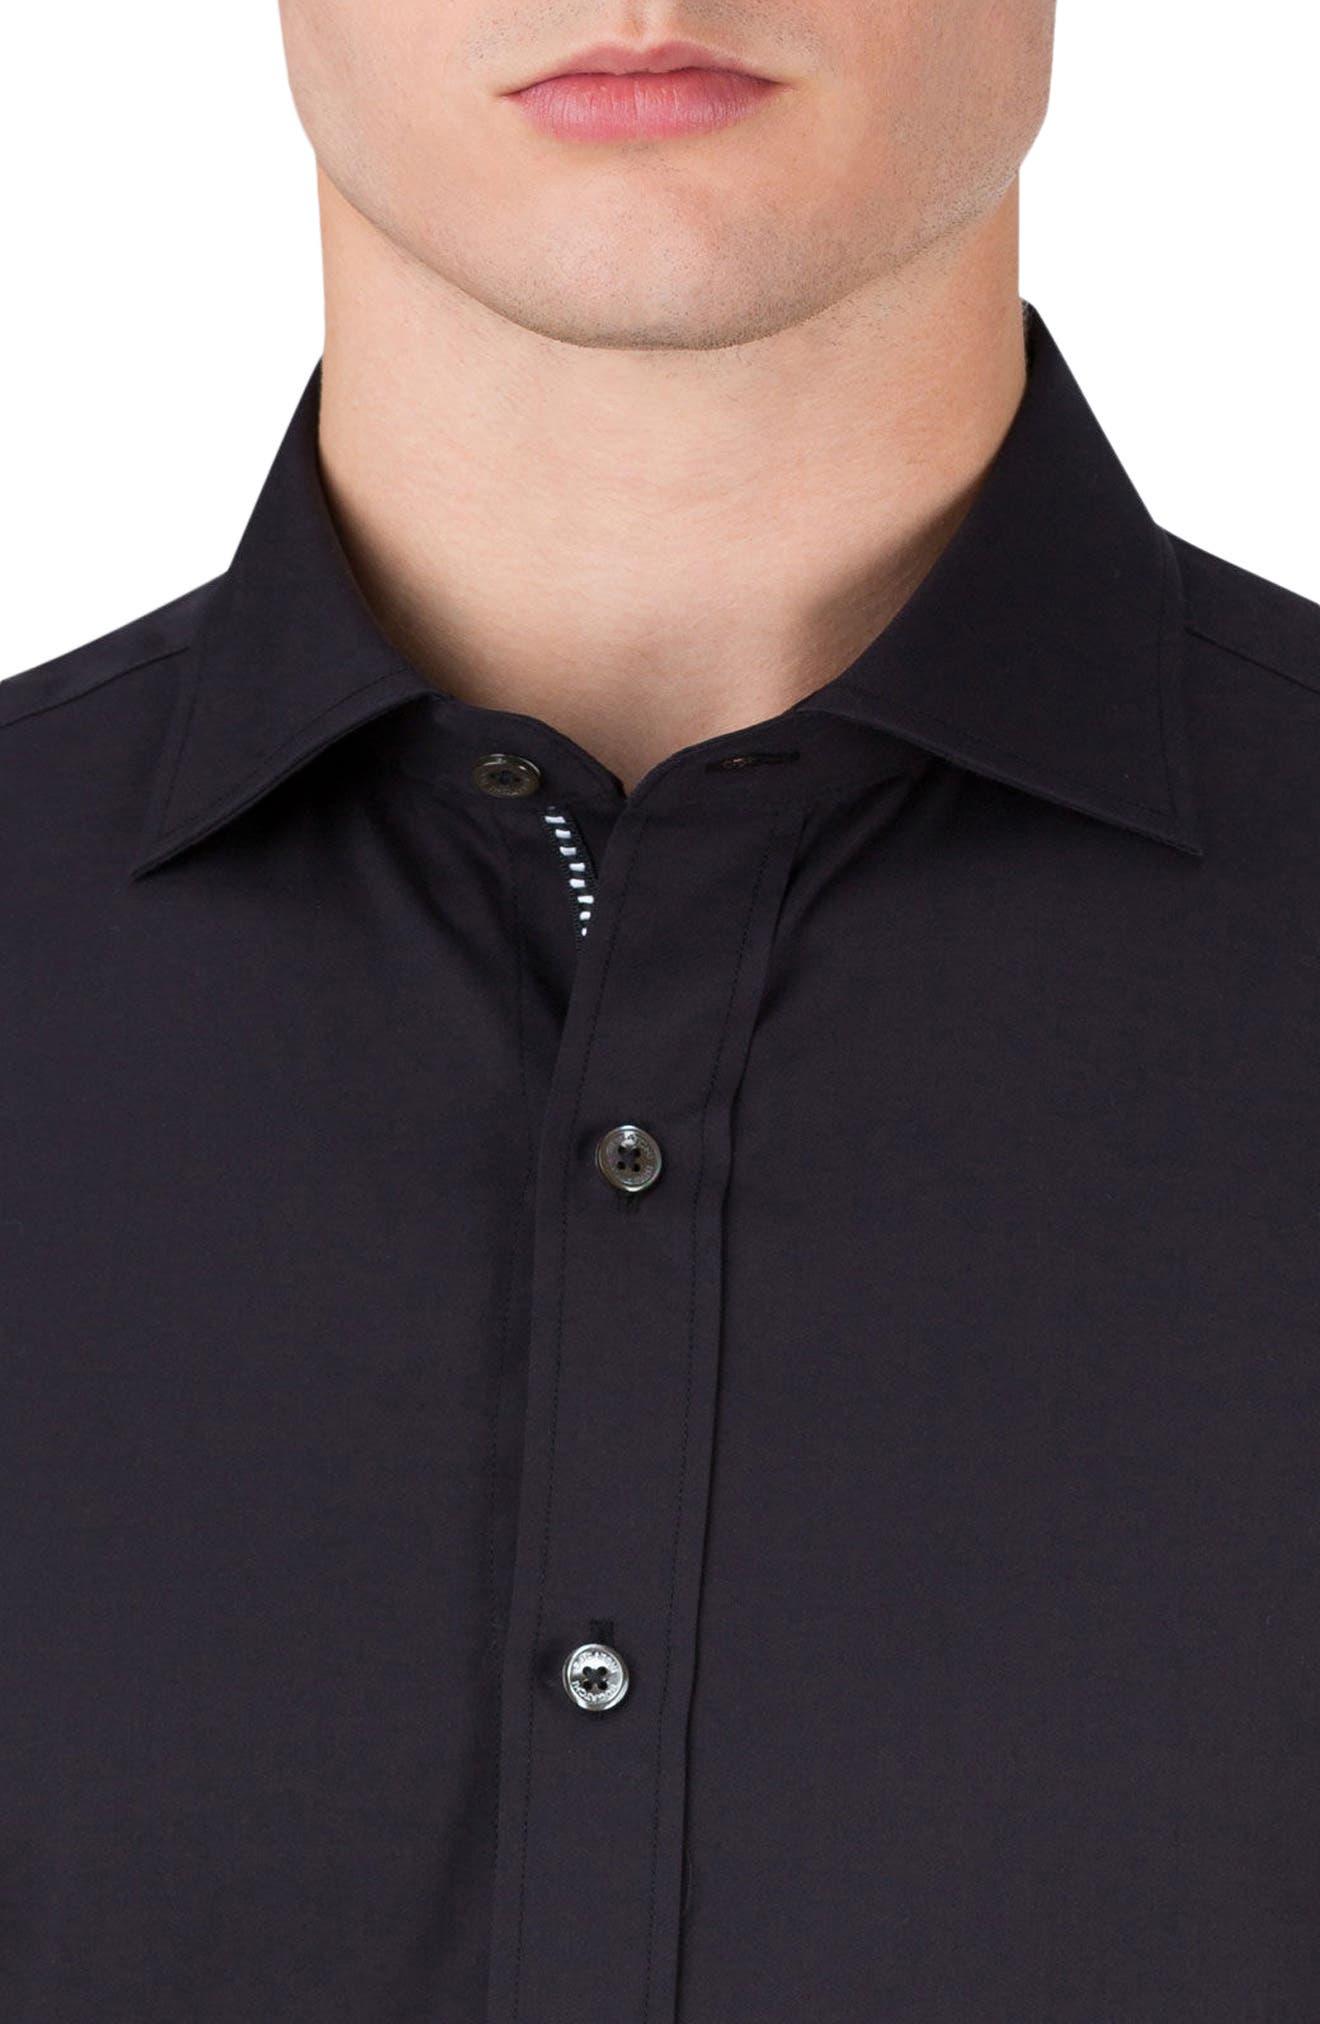 Classic Fit Sport Shirt,                             Alternate thumbnail 3, color,                             001